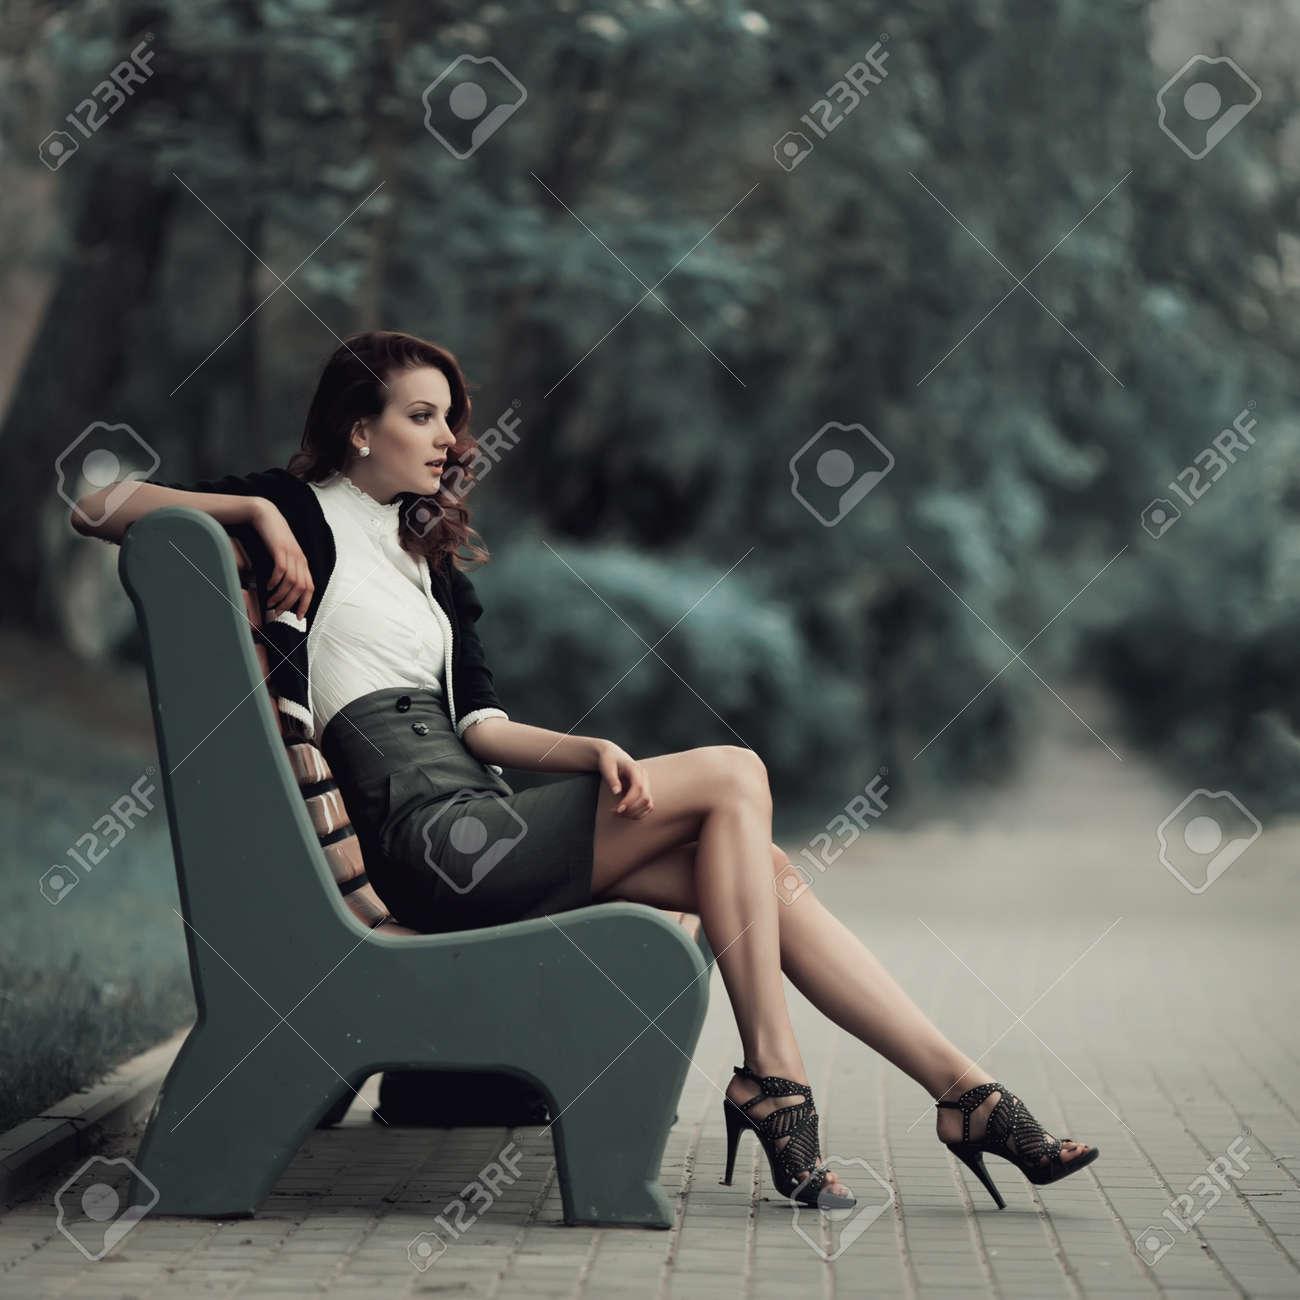 Смотреть фото девушки сидят на лавочке фото 676-204